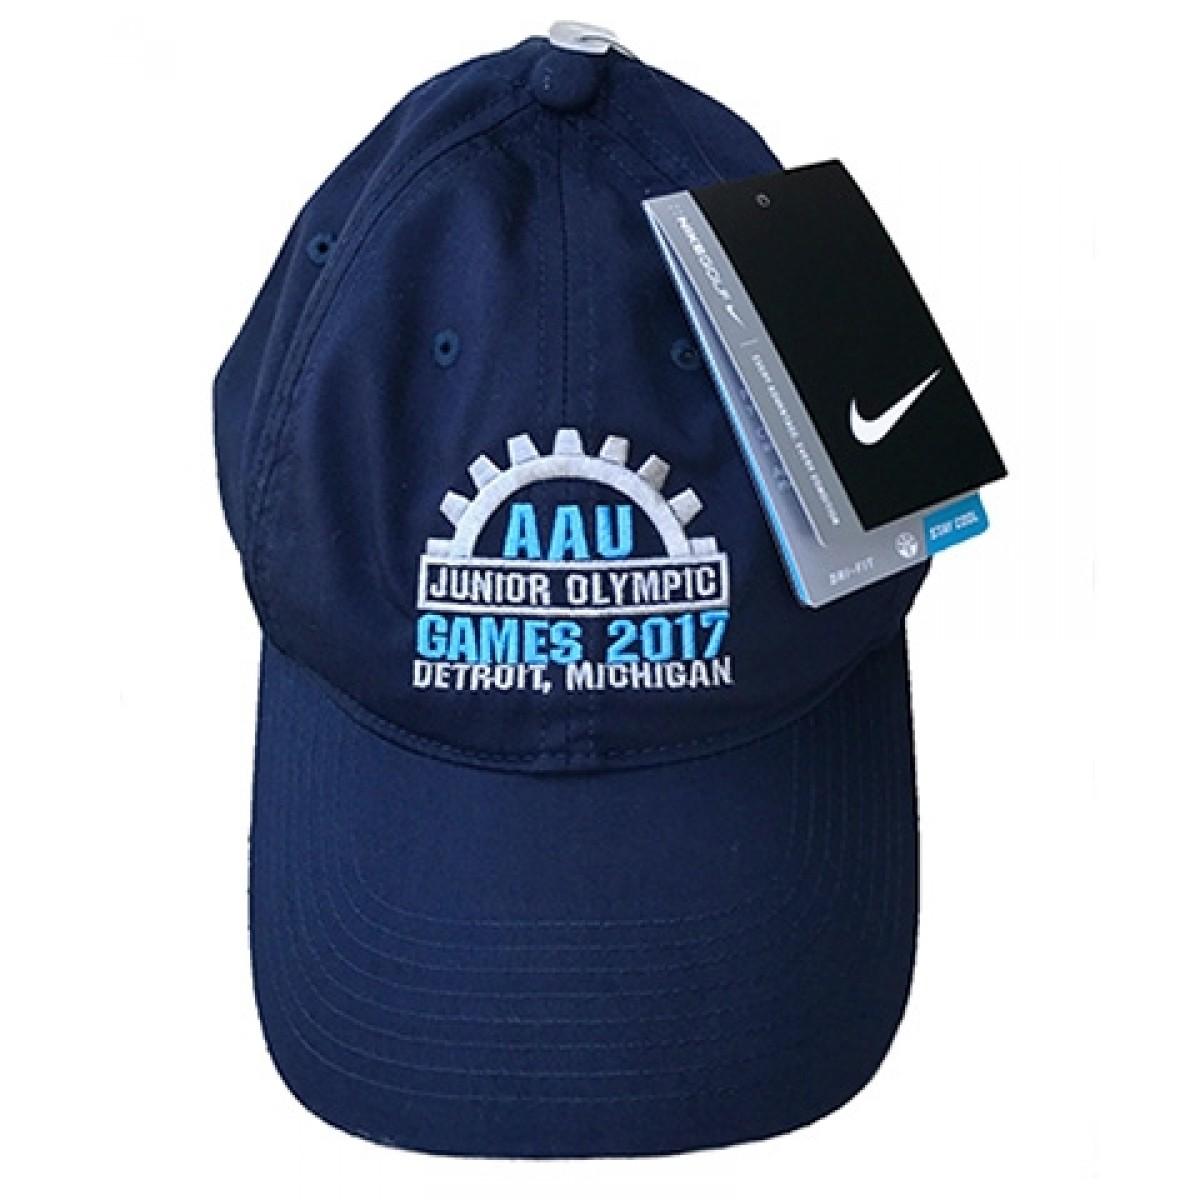 Navy Nike AAU Junior Olympics Hat